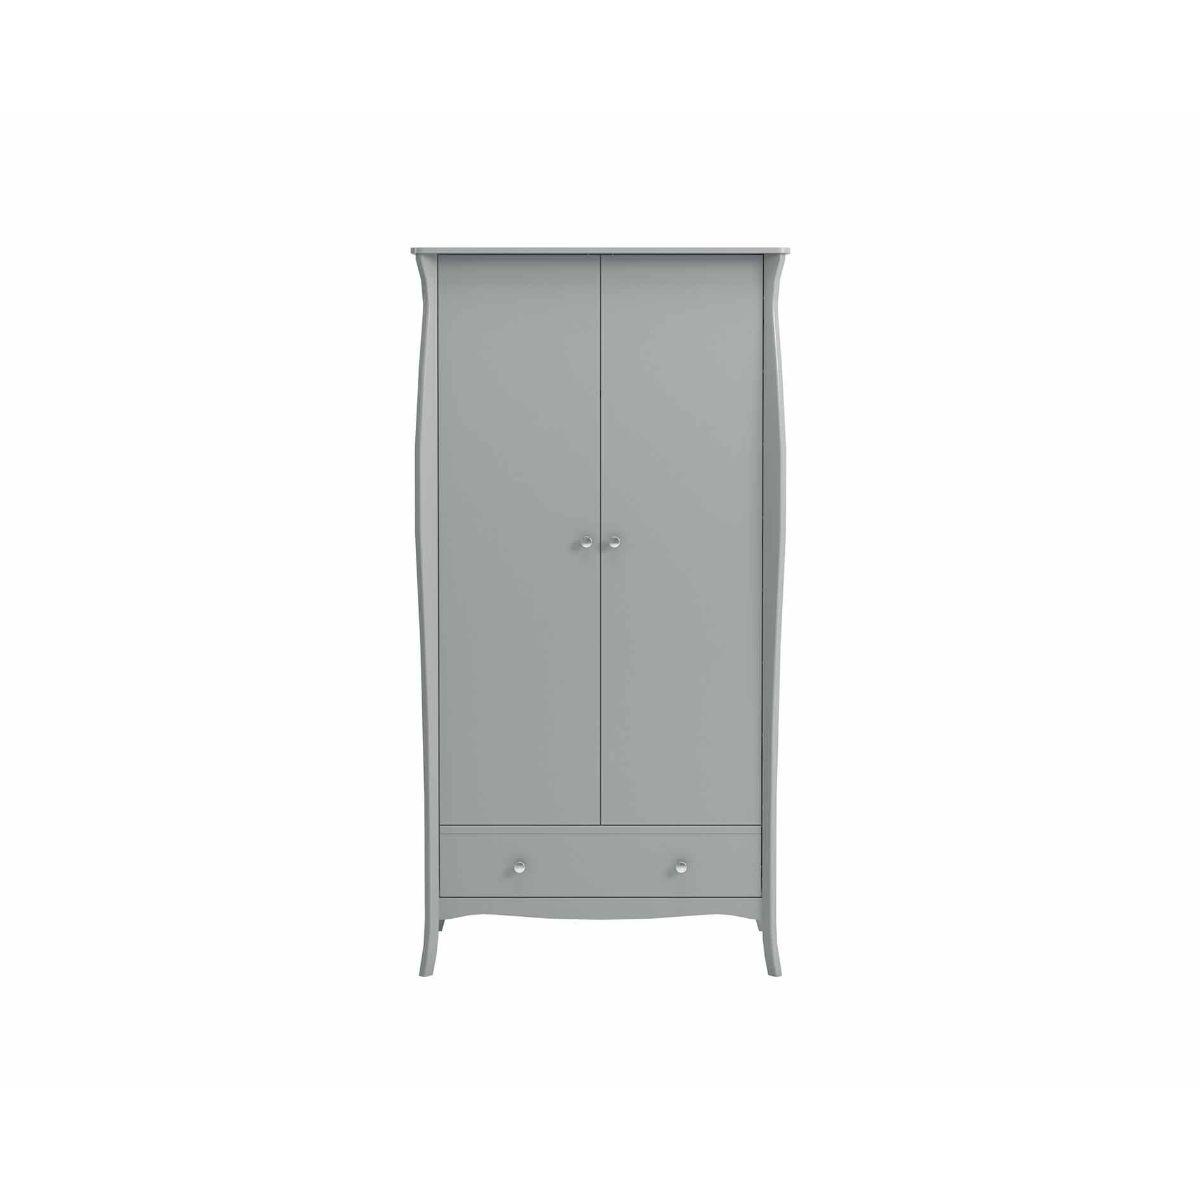 Steens Baroque 2 Door Wardrobe, Grey